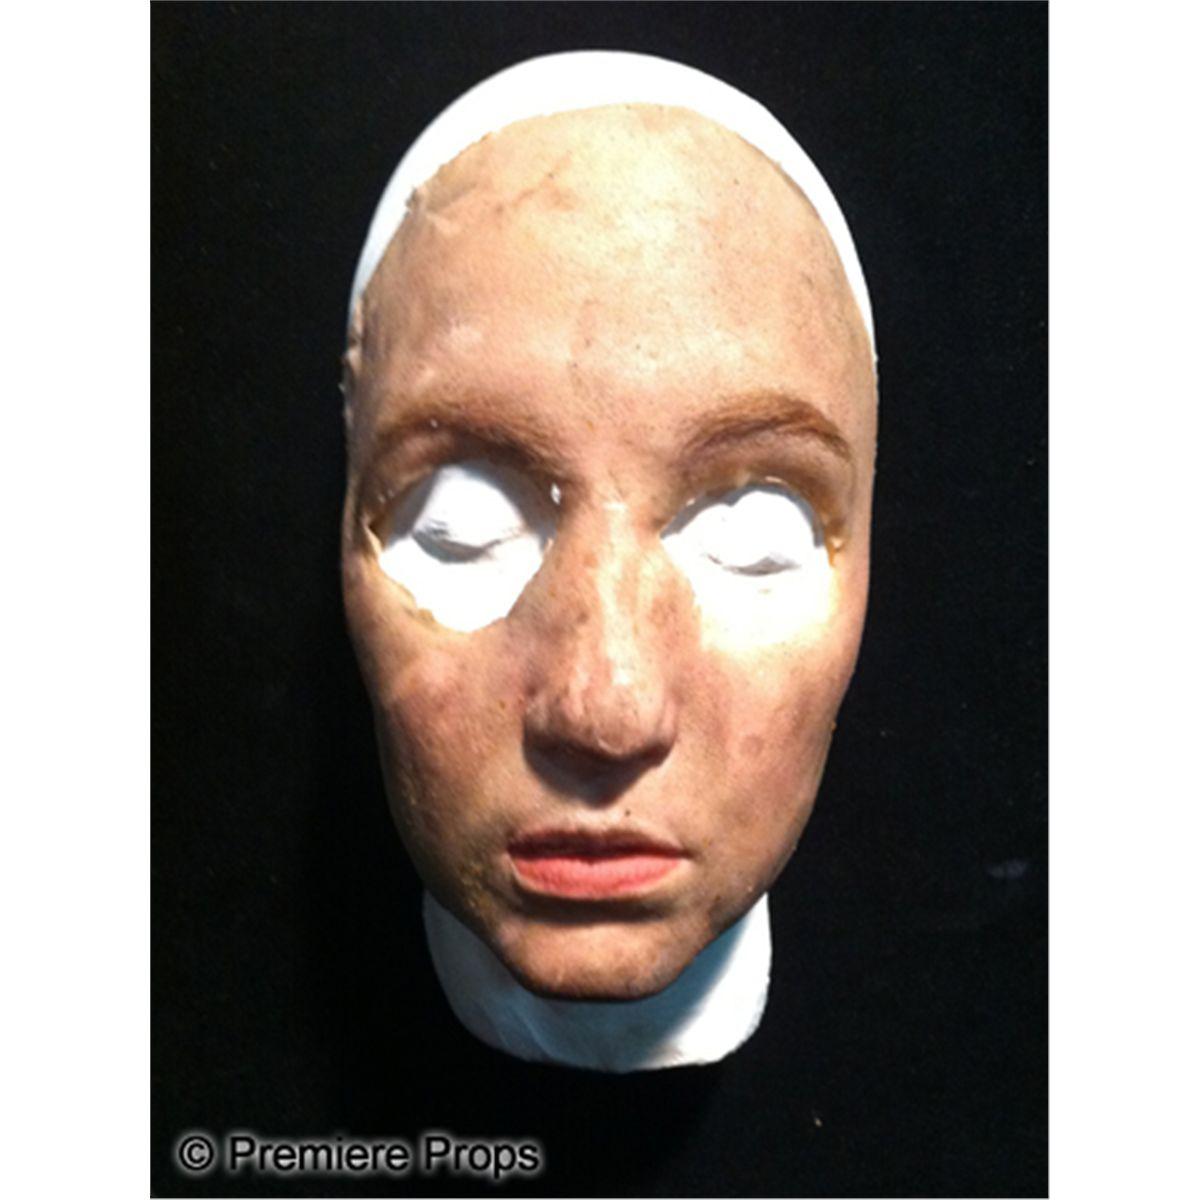 Nip/Tuck (2003-2010) Prosthetic Face Mask and Lifecast